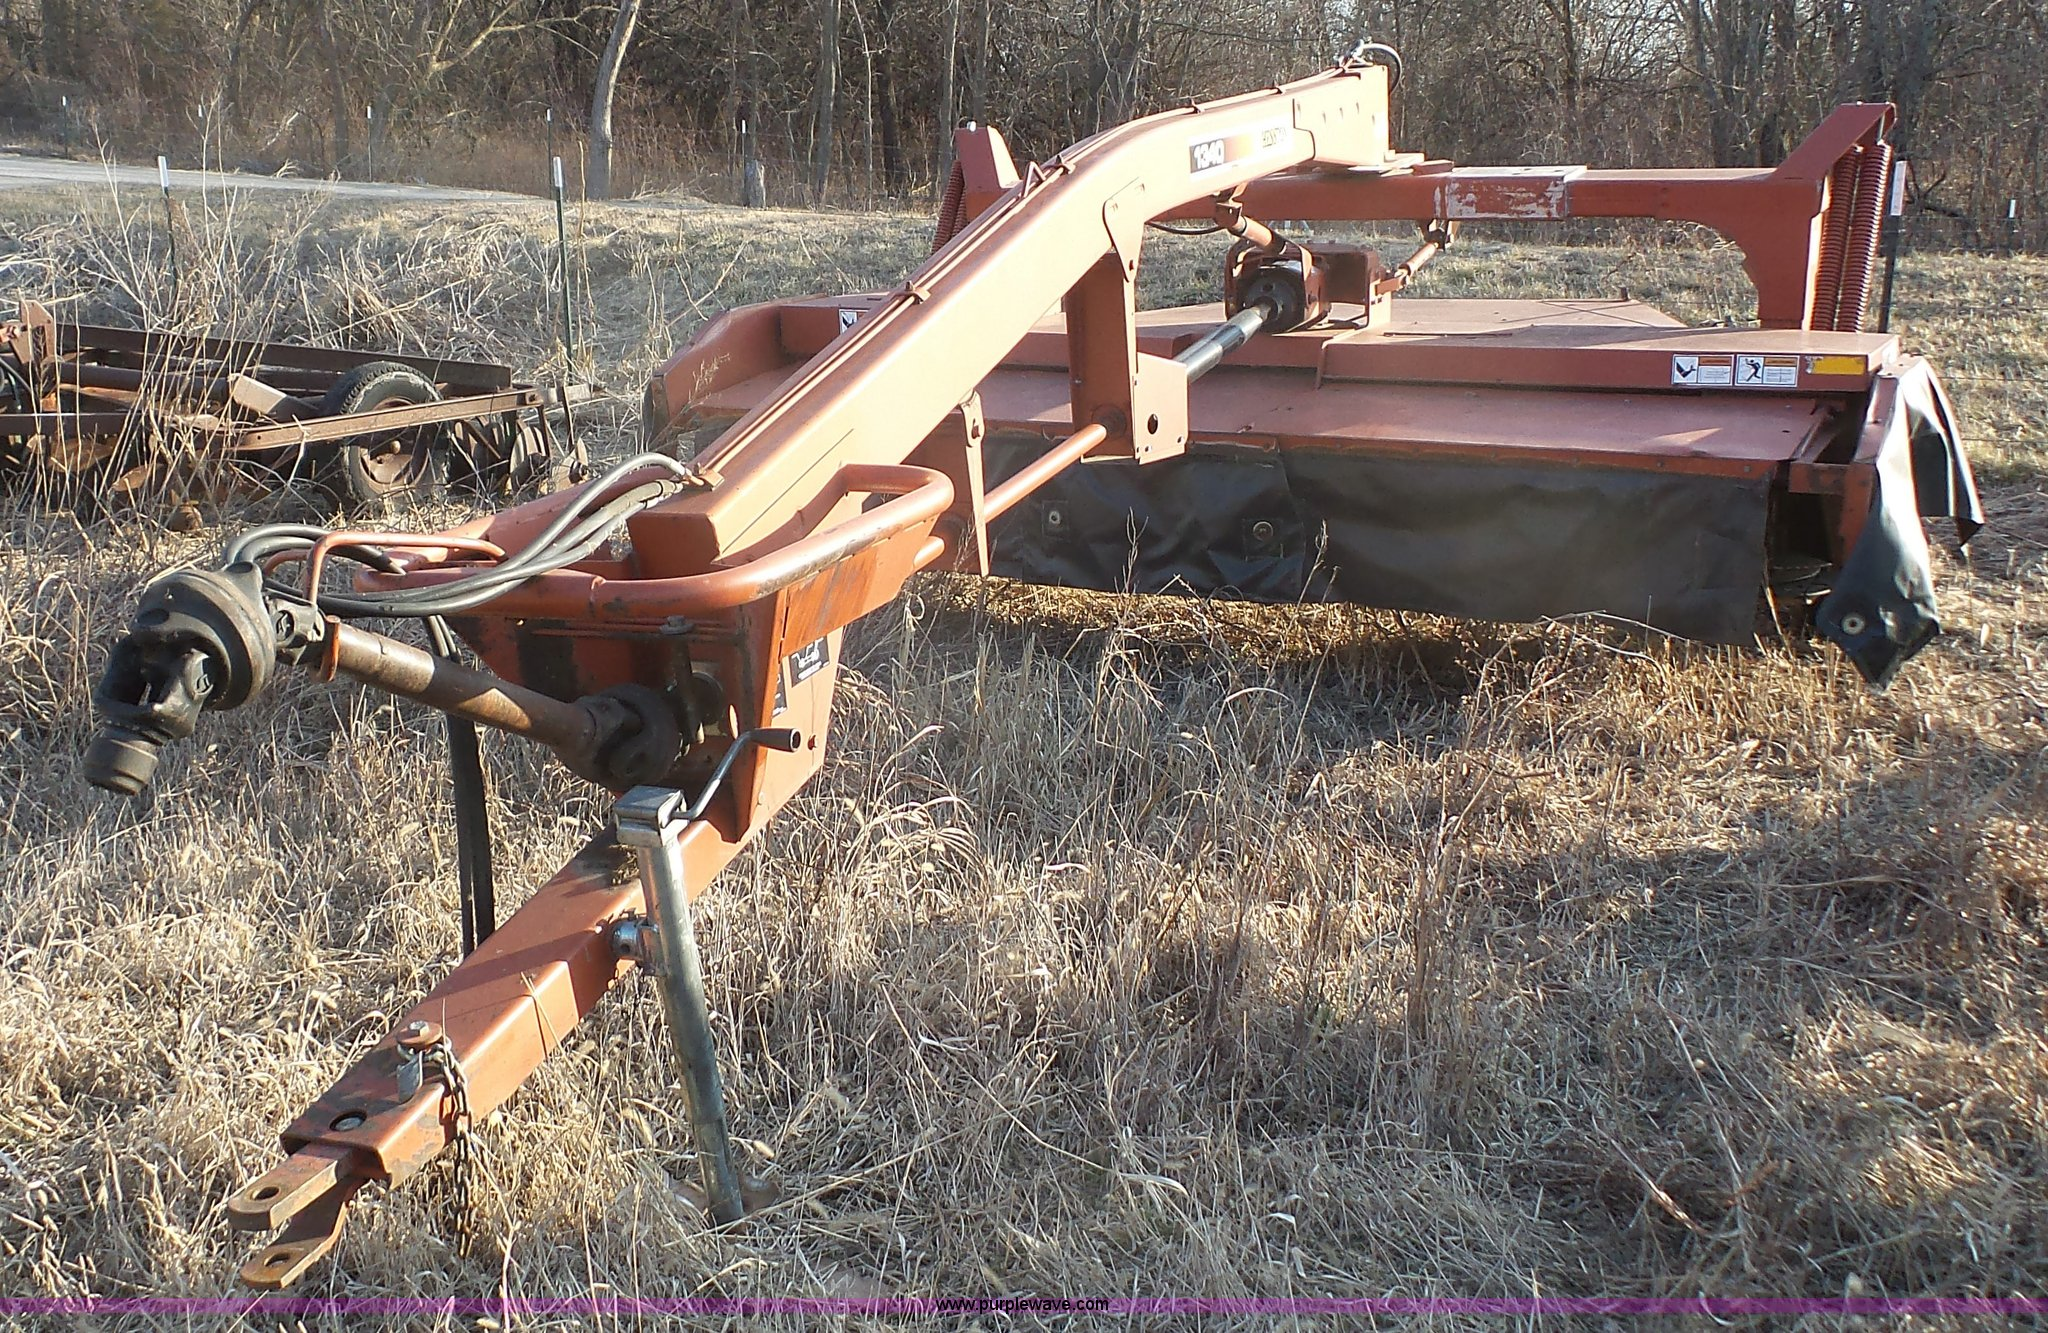 hesston 1340 windrower item j4683 sold march 16 ag equi rh purplewave com Hesston 1340 Specifications Hesston Discbine